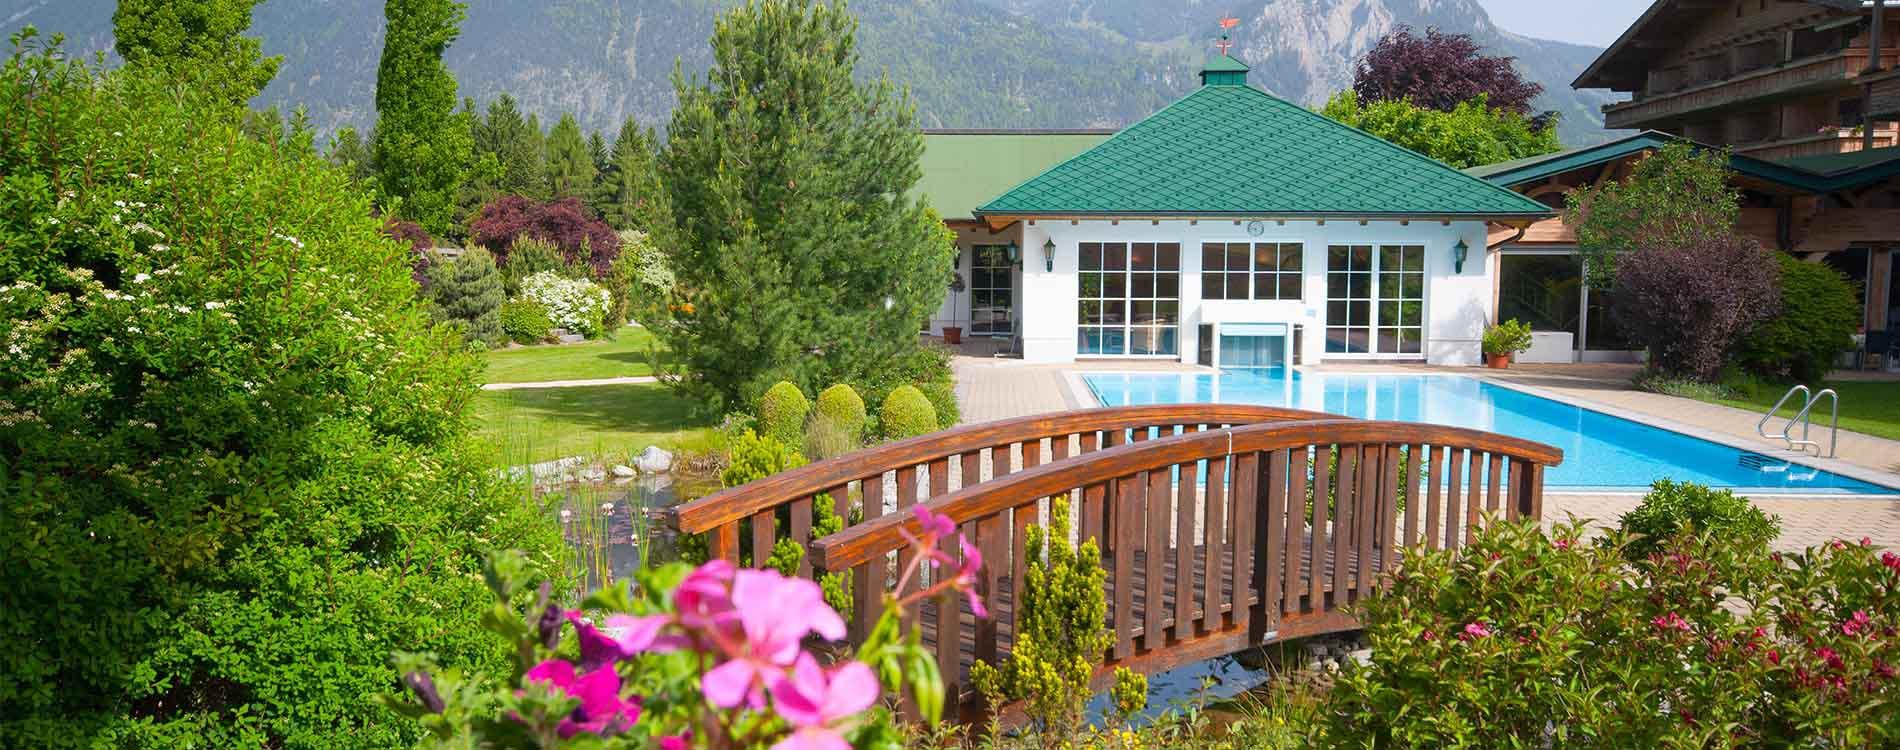 Pirchner Hof Reith Alpbach Valley Tyrol Holistic Hildegard von Bingen Naturopathy rejuvenation week Outsidepool Summer holidays